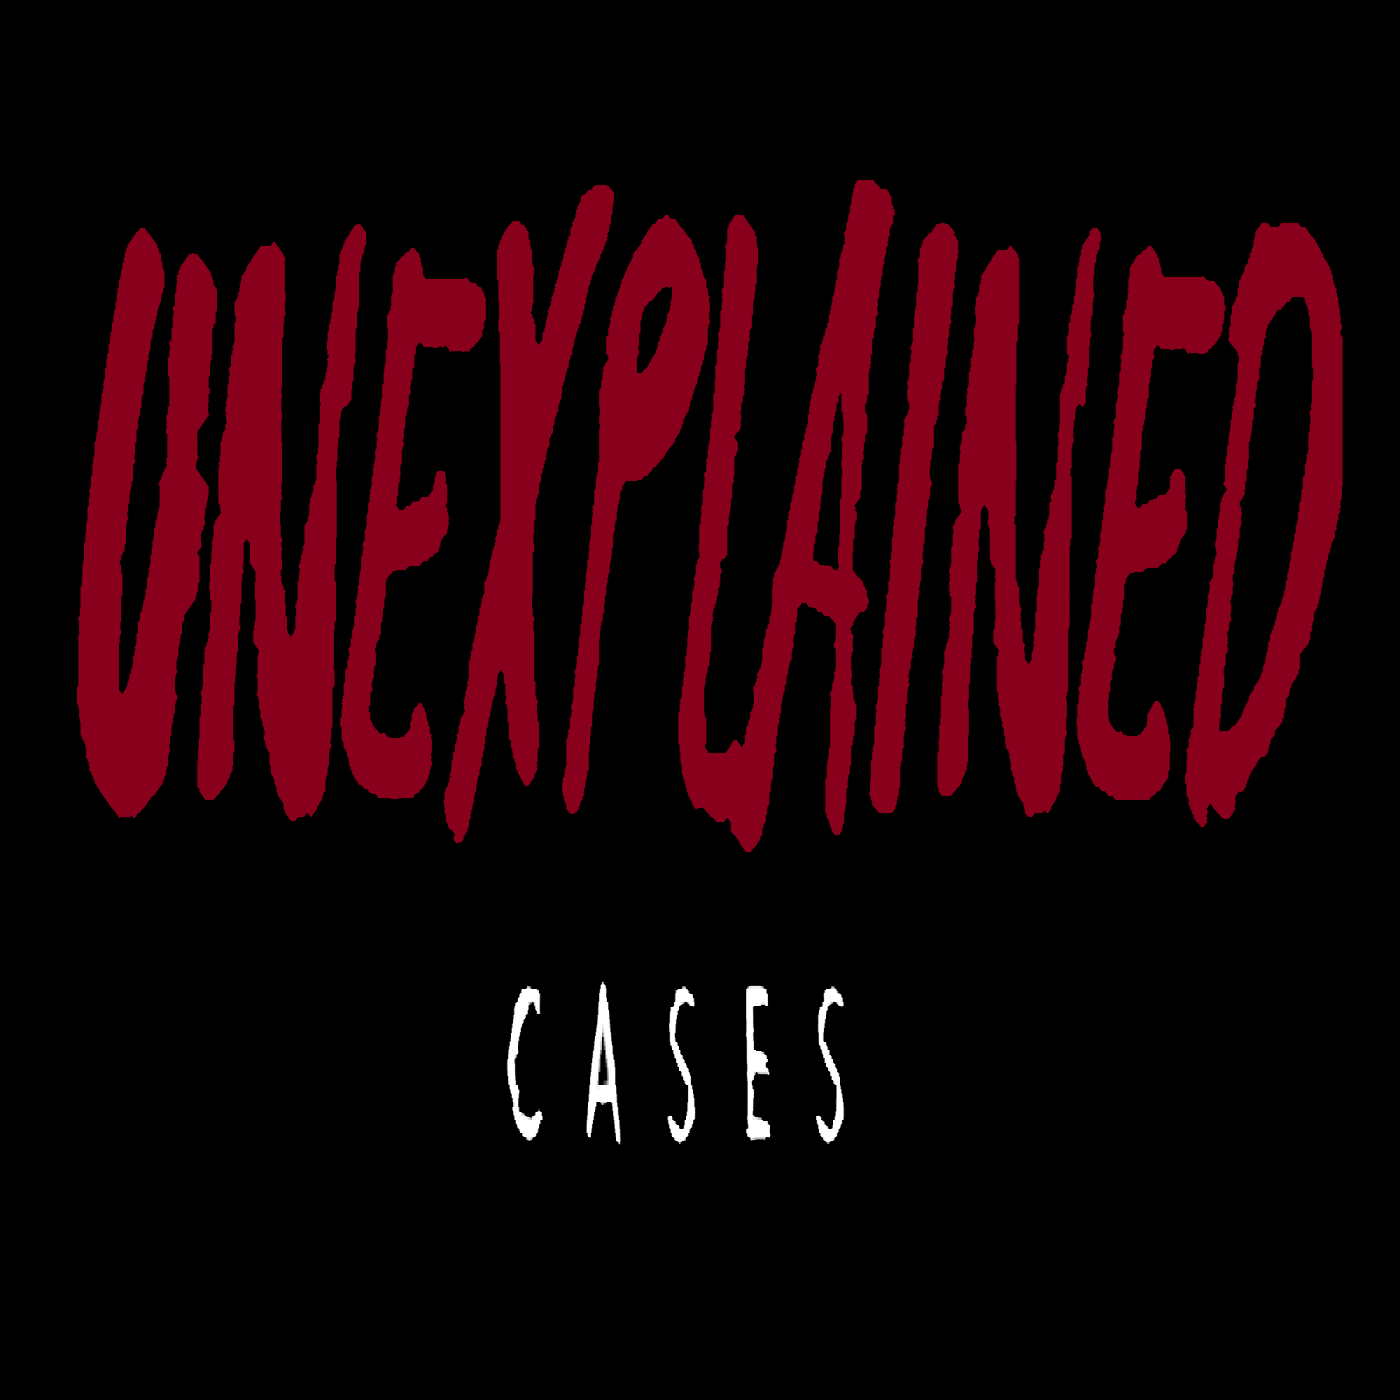 Artwork for (VIDEO) Unexplained Cases Episode 13: Confronting A Demon